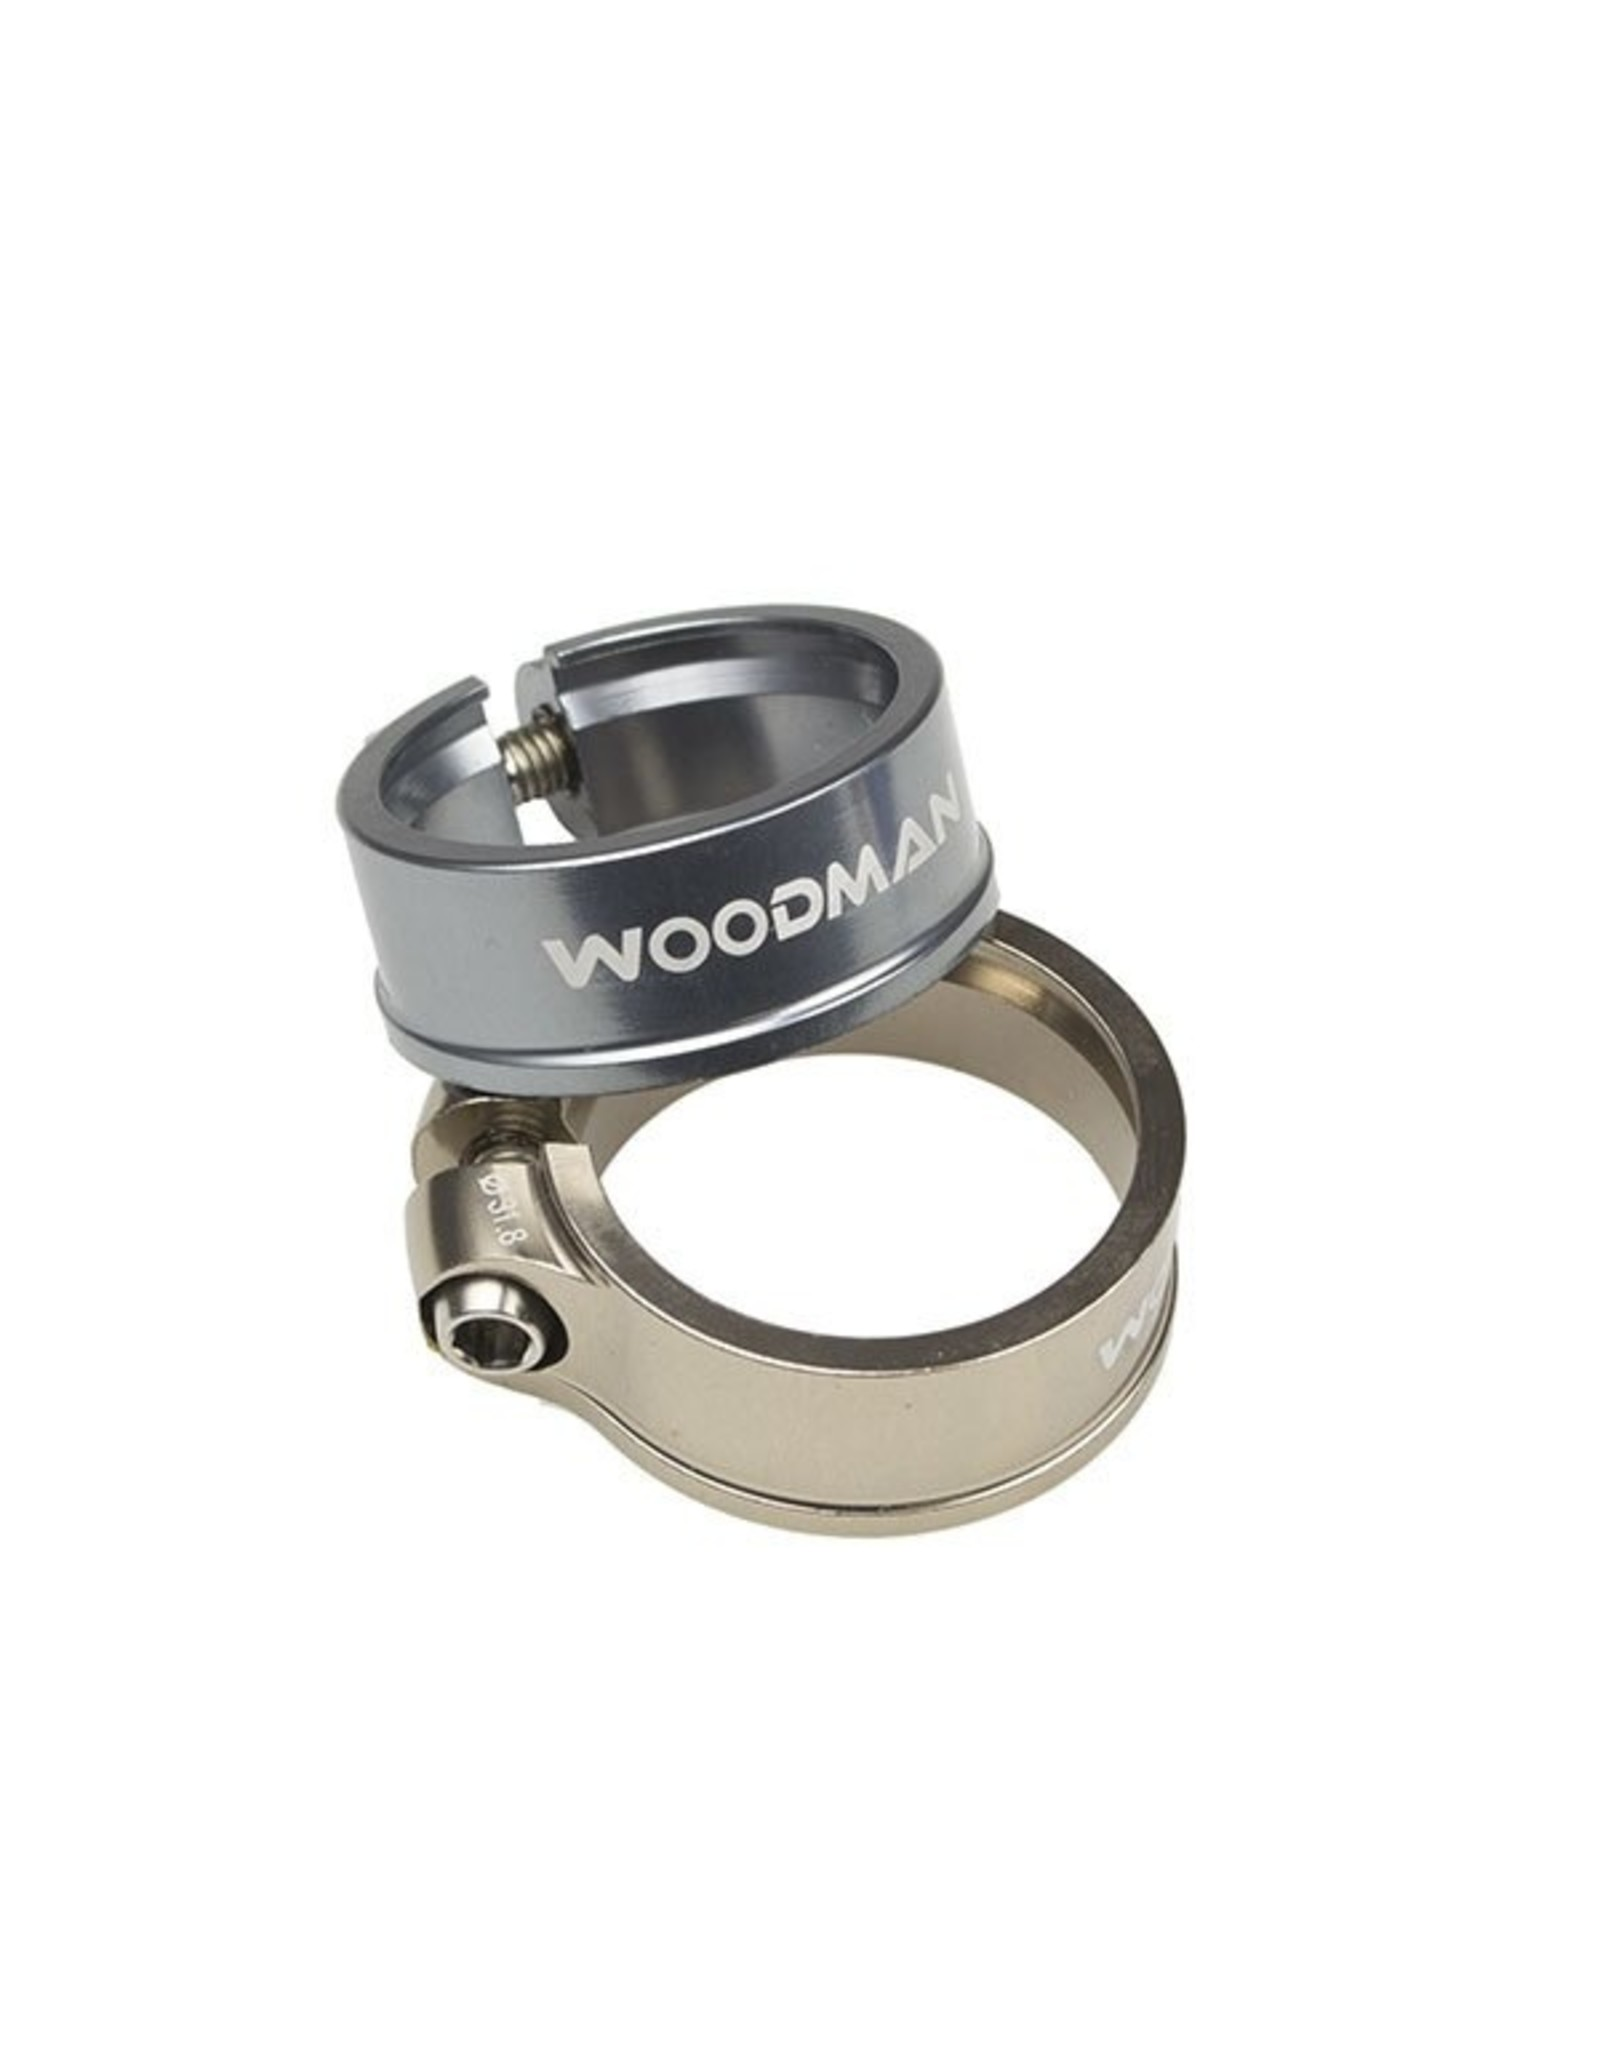 Woodman Woodman Deathgrip TCSL Seatpost Collar